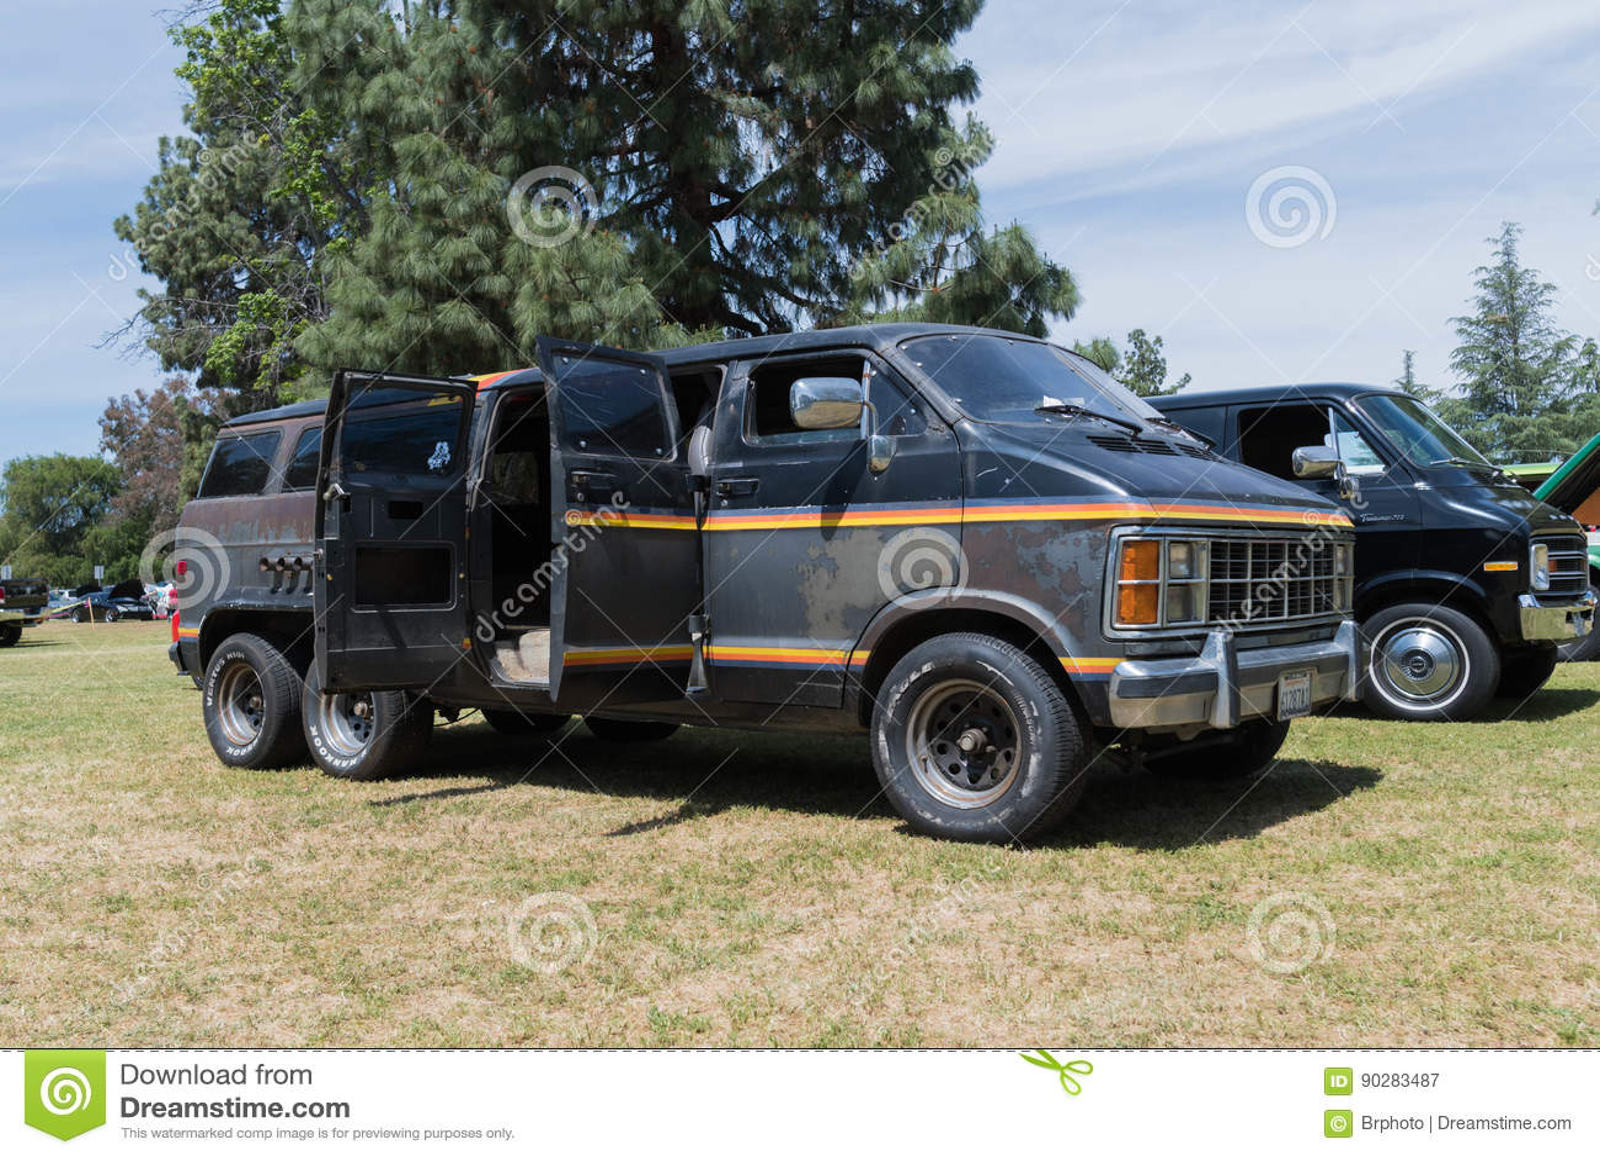 Van Nuys Dodge >> Dodge Ram Van On Display Editorial Photography Image Of Model